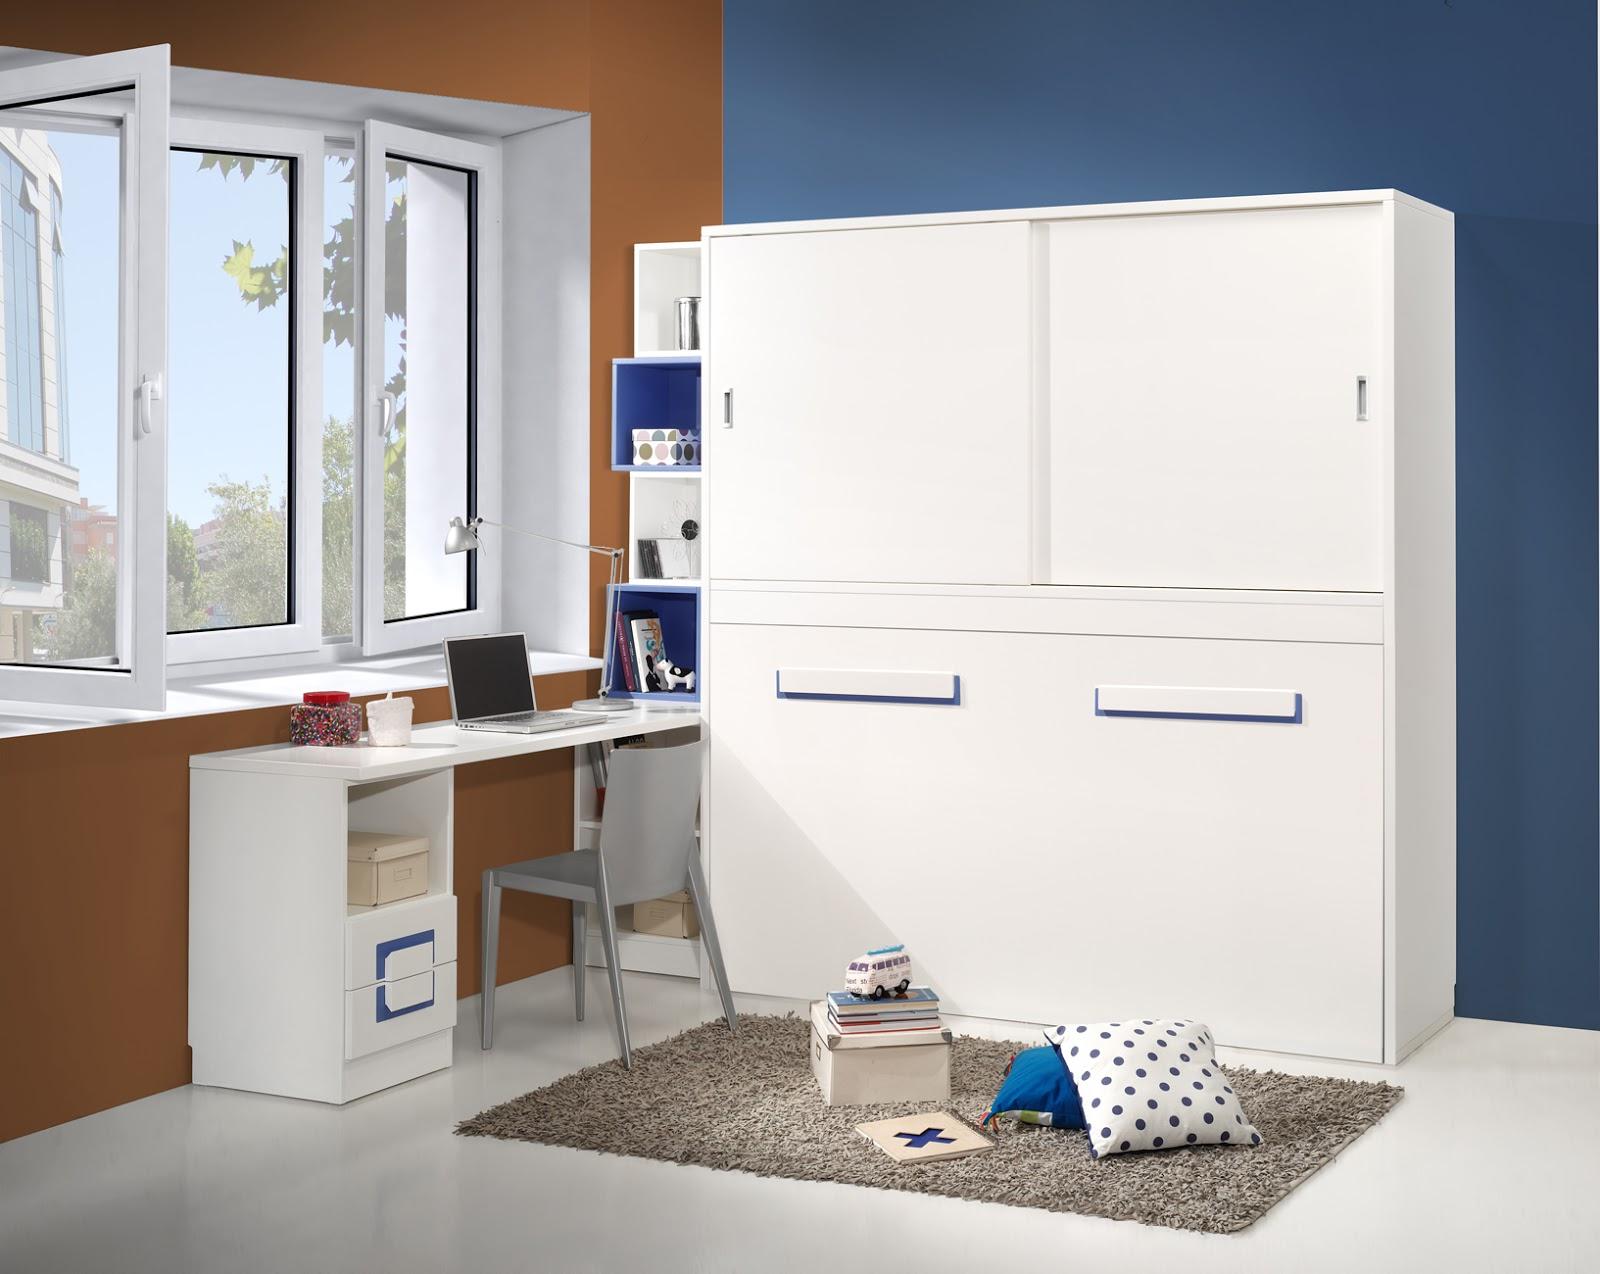 Dormitorios con camas abatibles literas abatibles for Camas abatibles juveniles